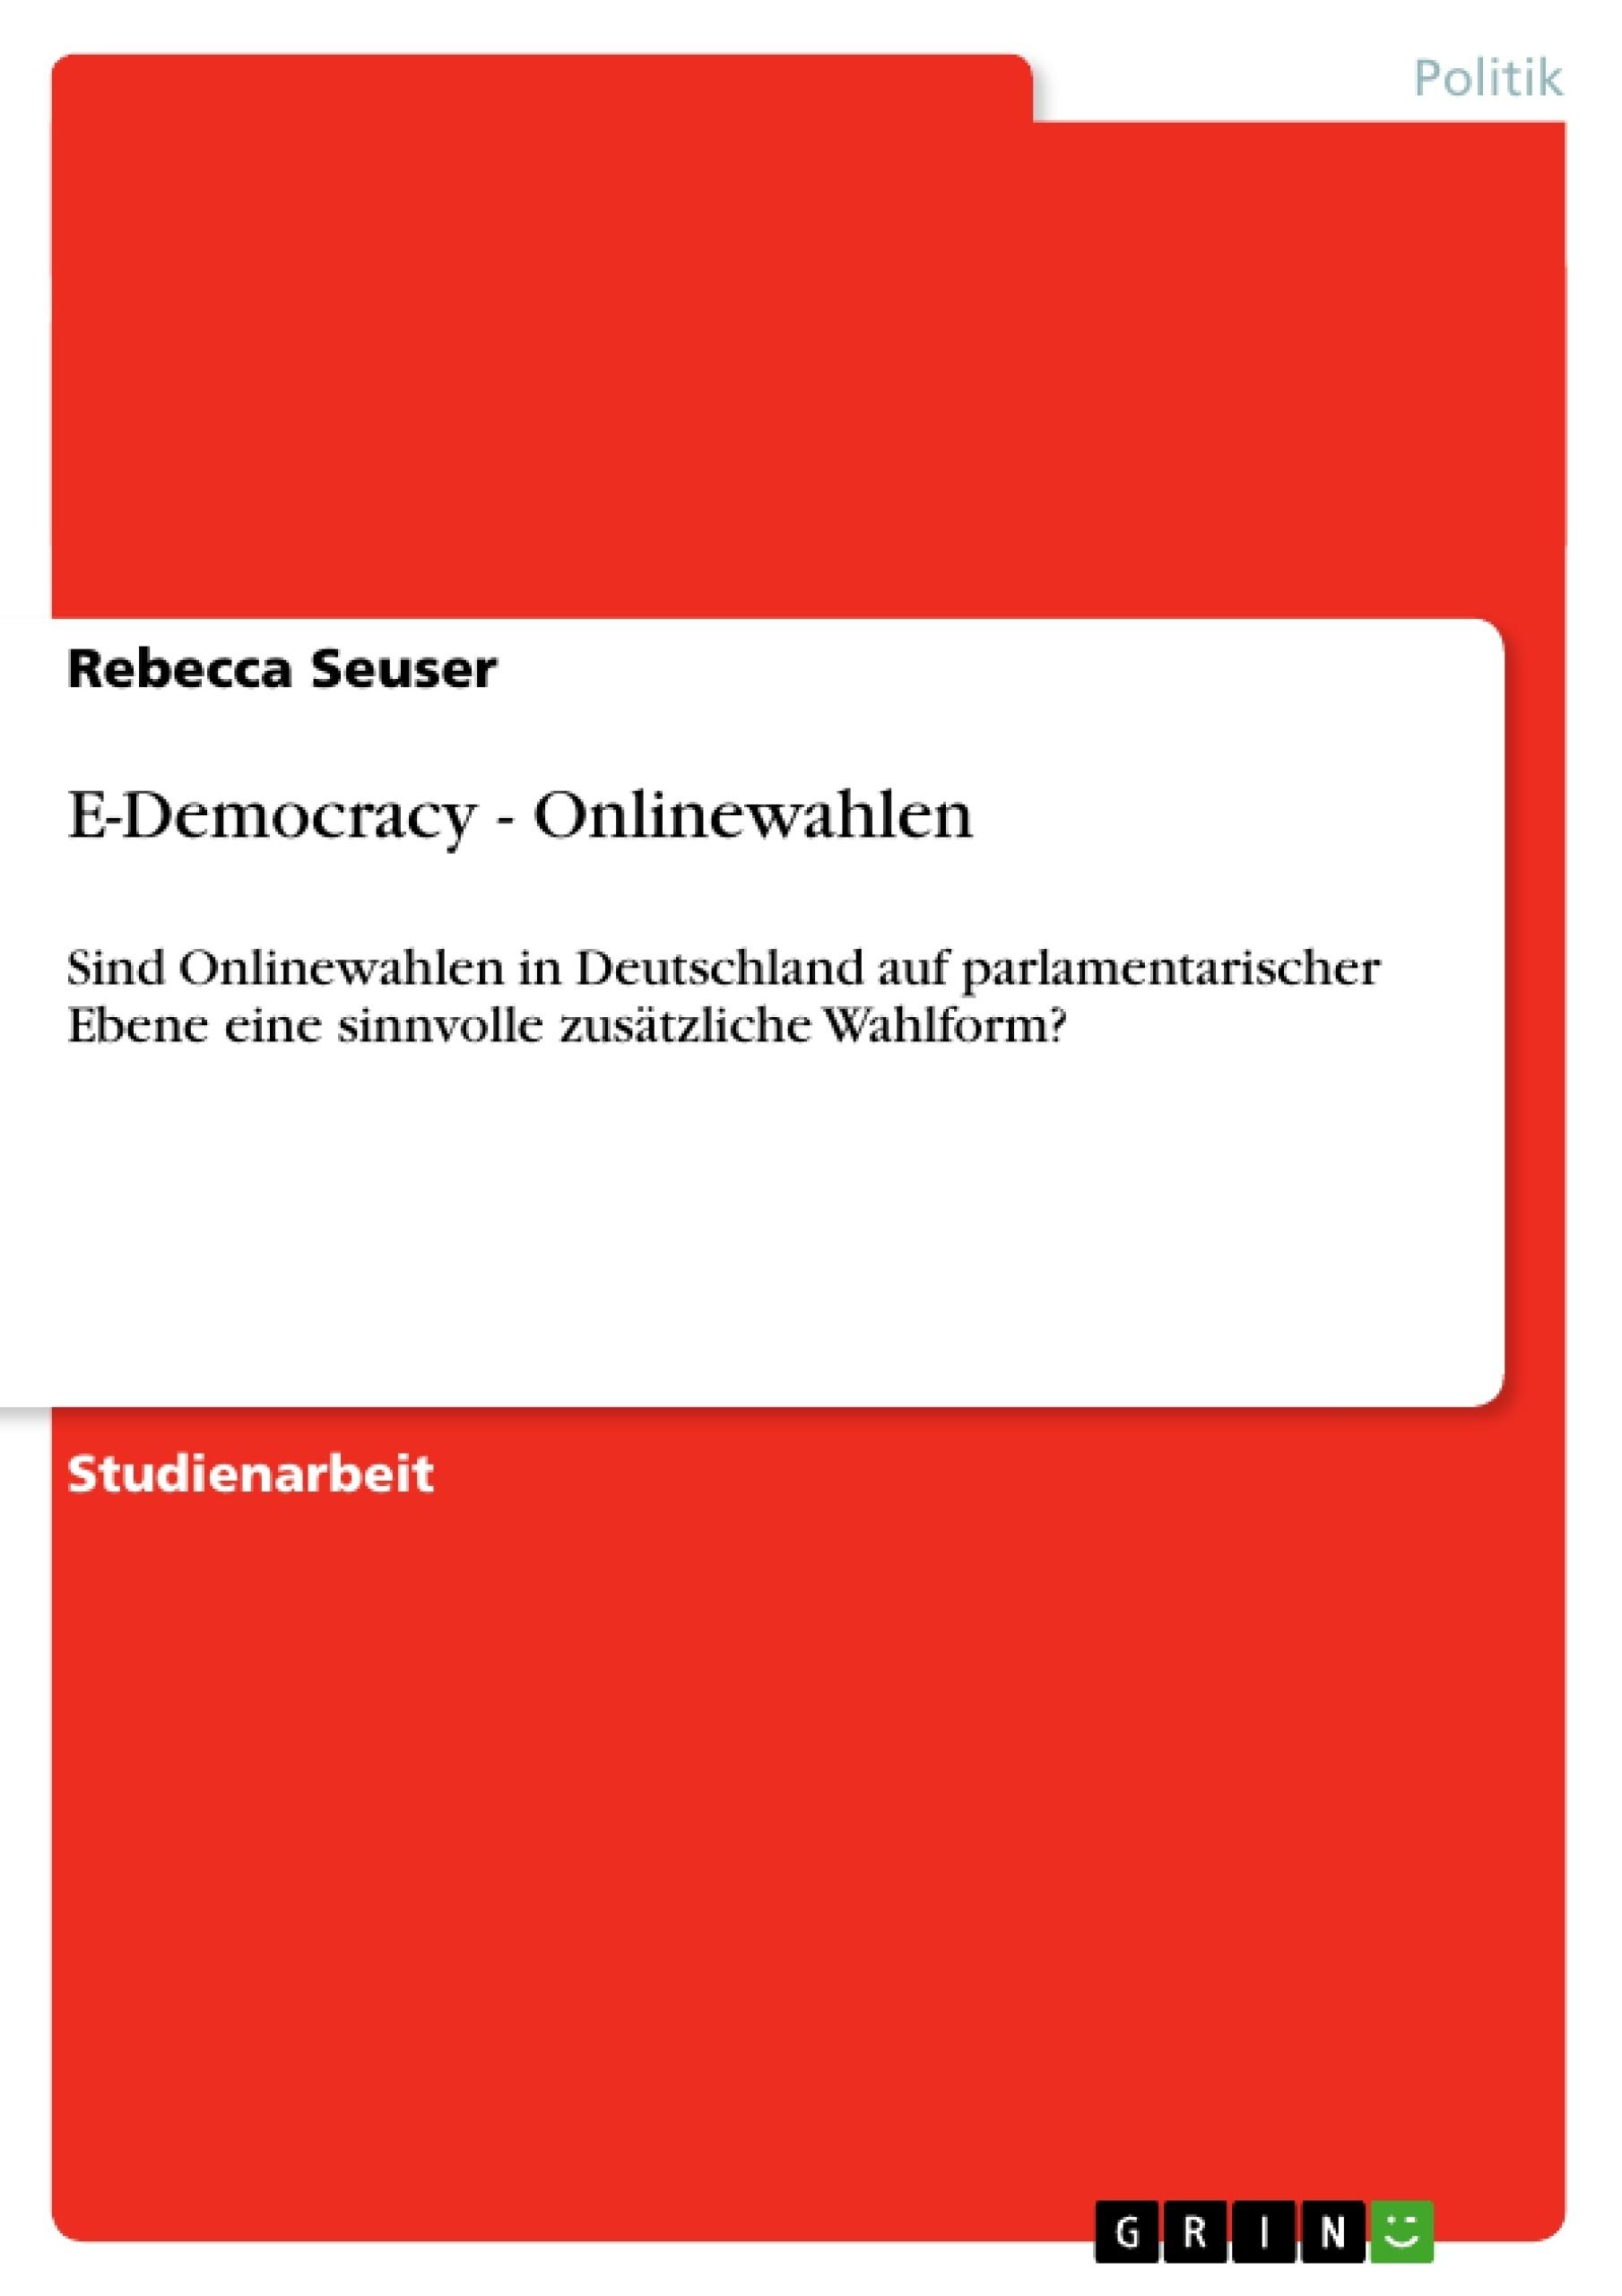 Titel: E-Democracy - Onlinewahlen